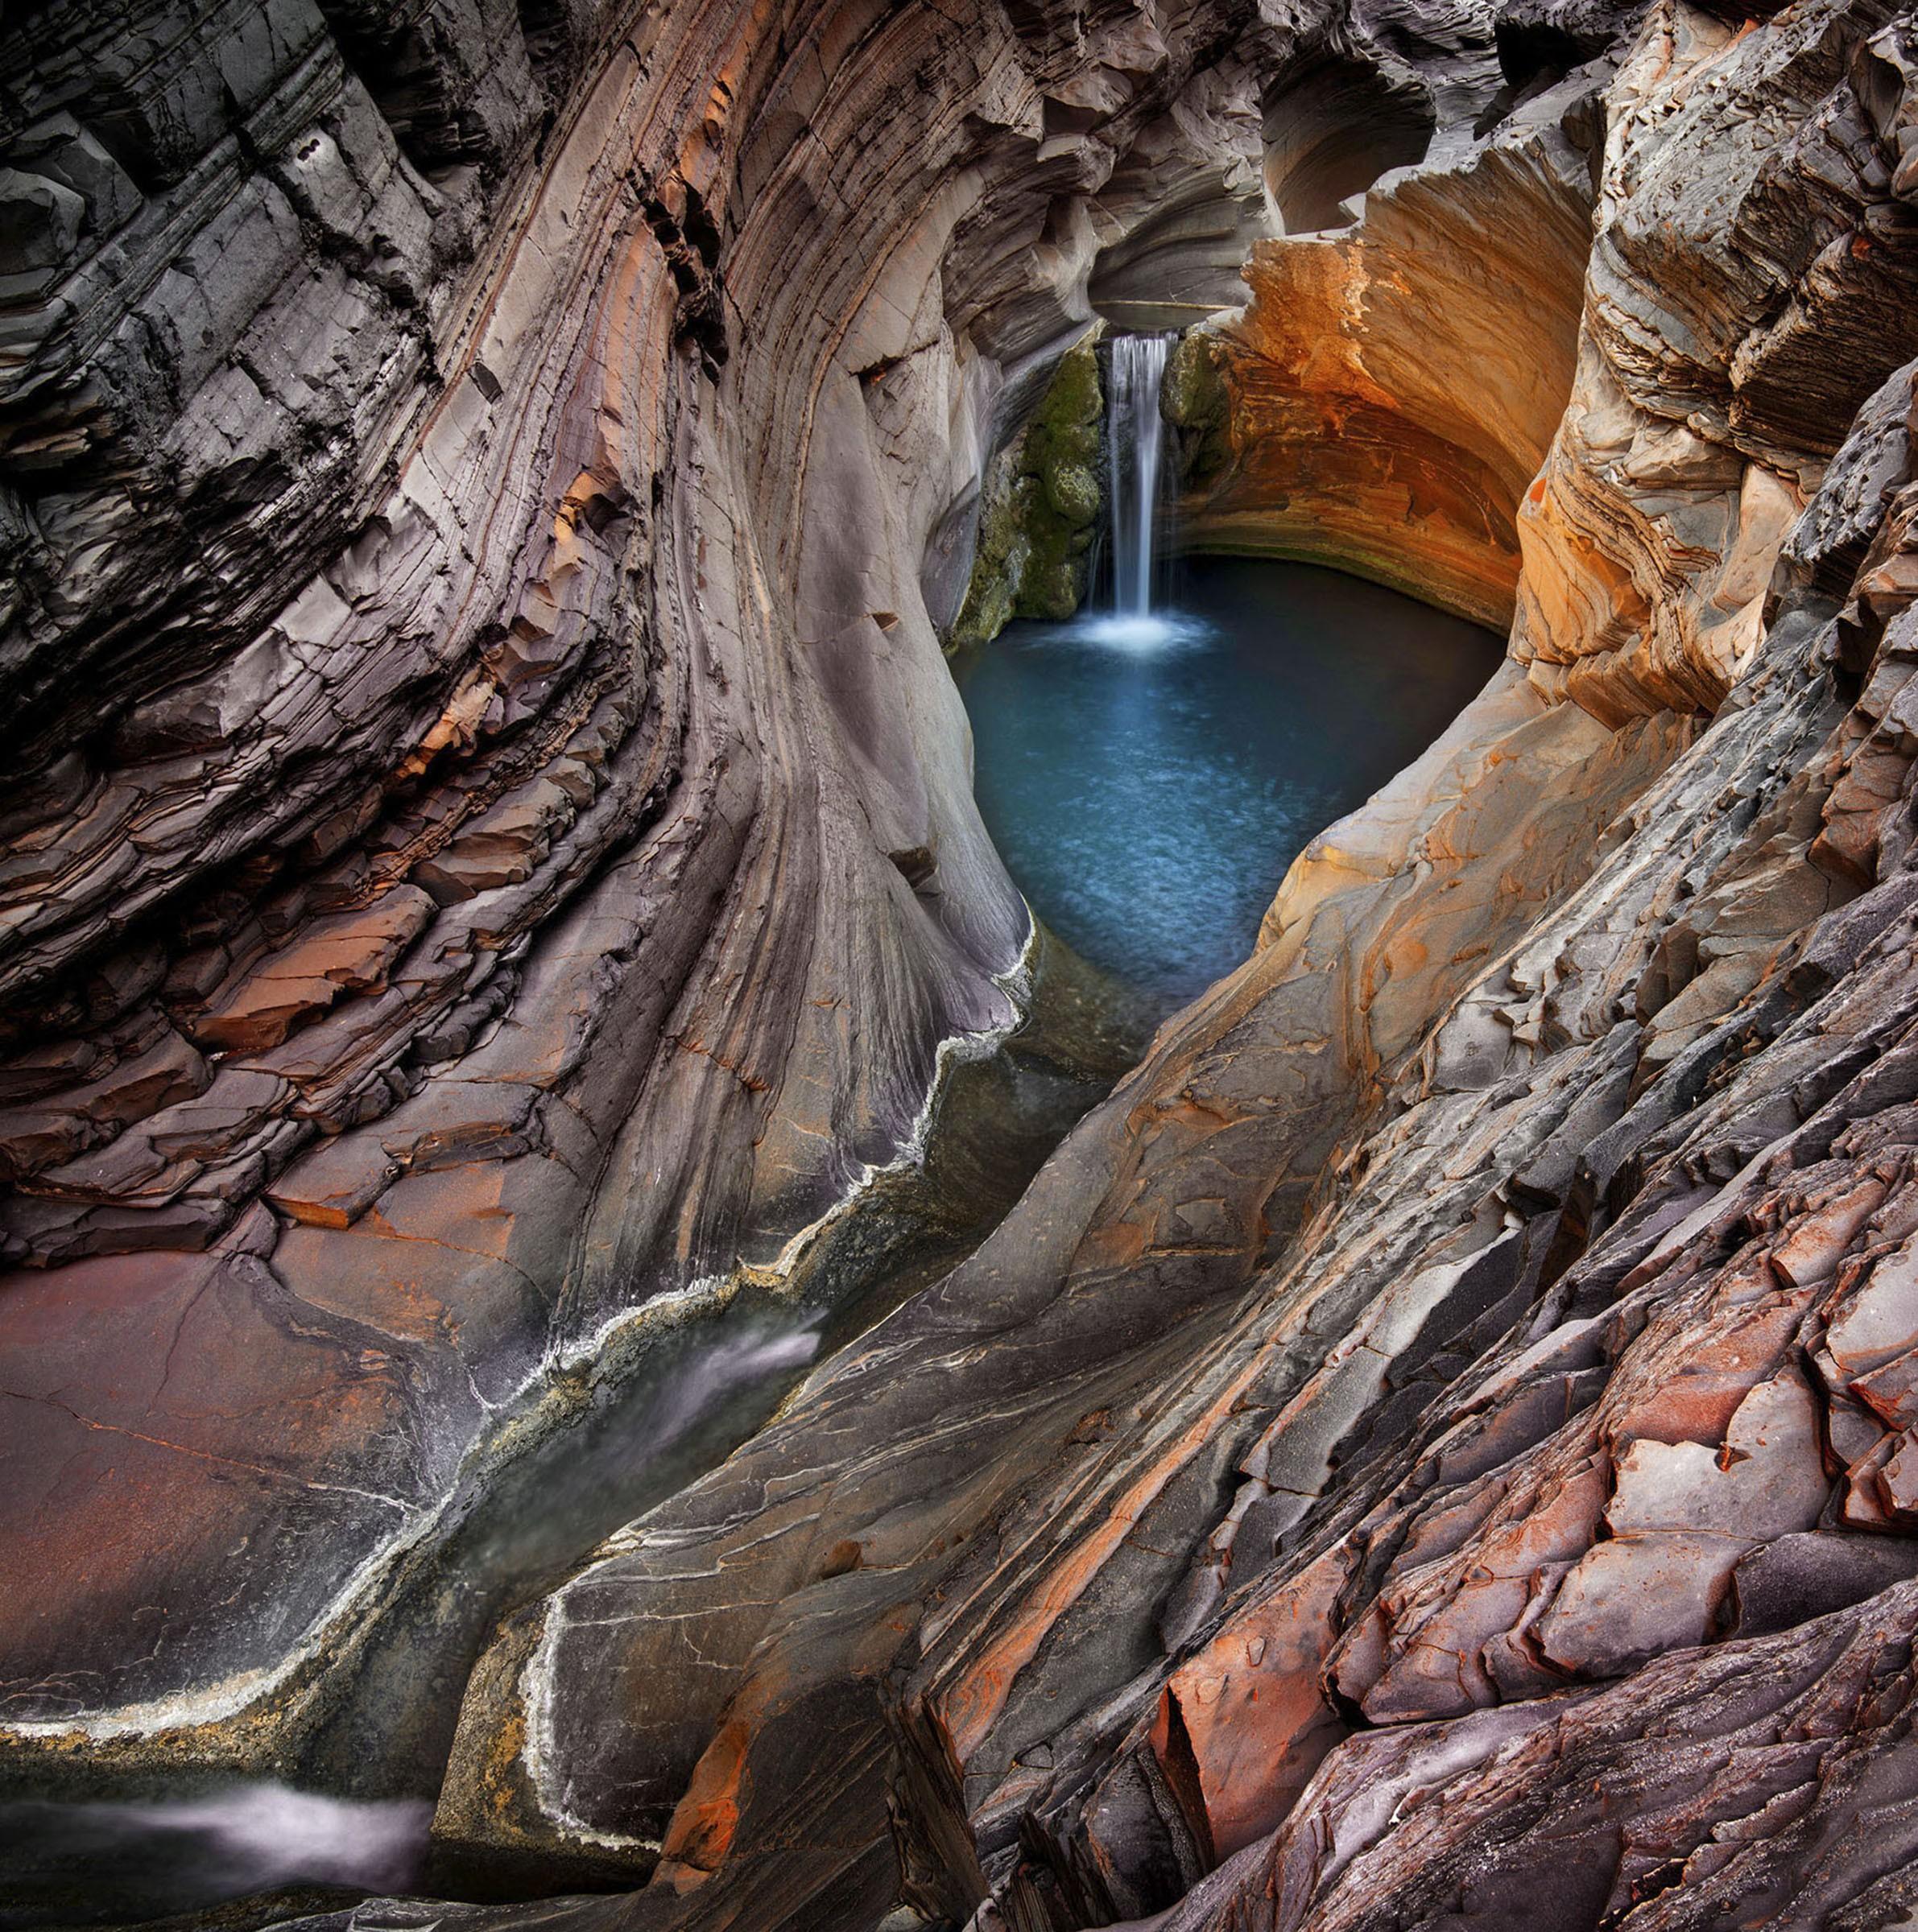 Wallpaper Waterfall, 4k, HD Wallpaper, Hamersley Gorge